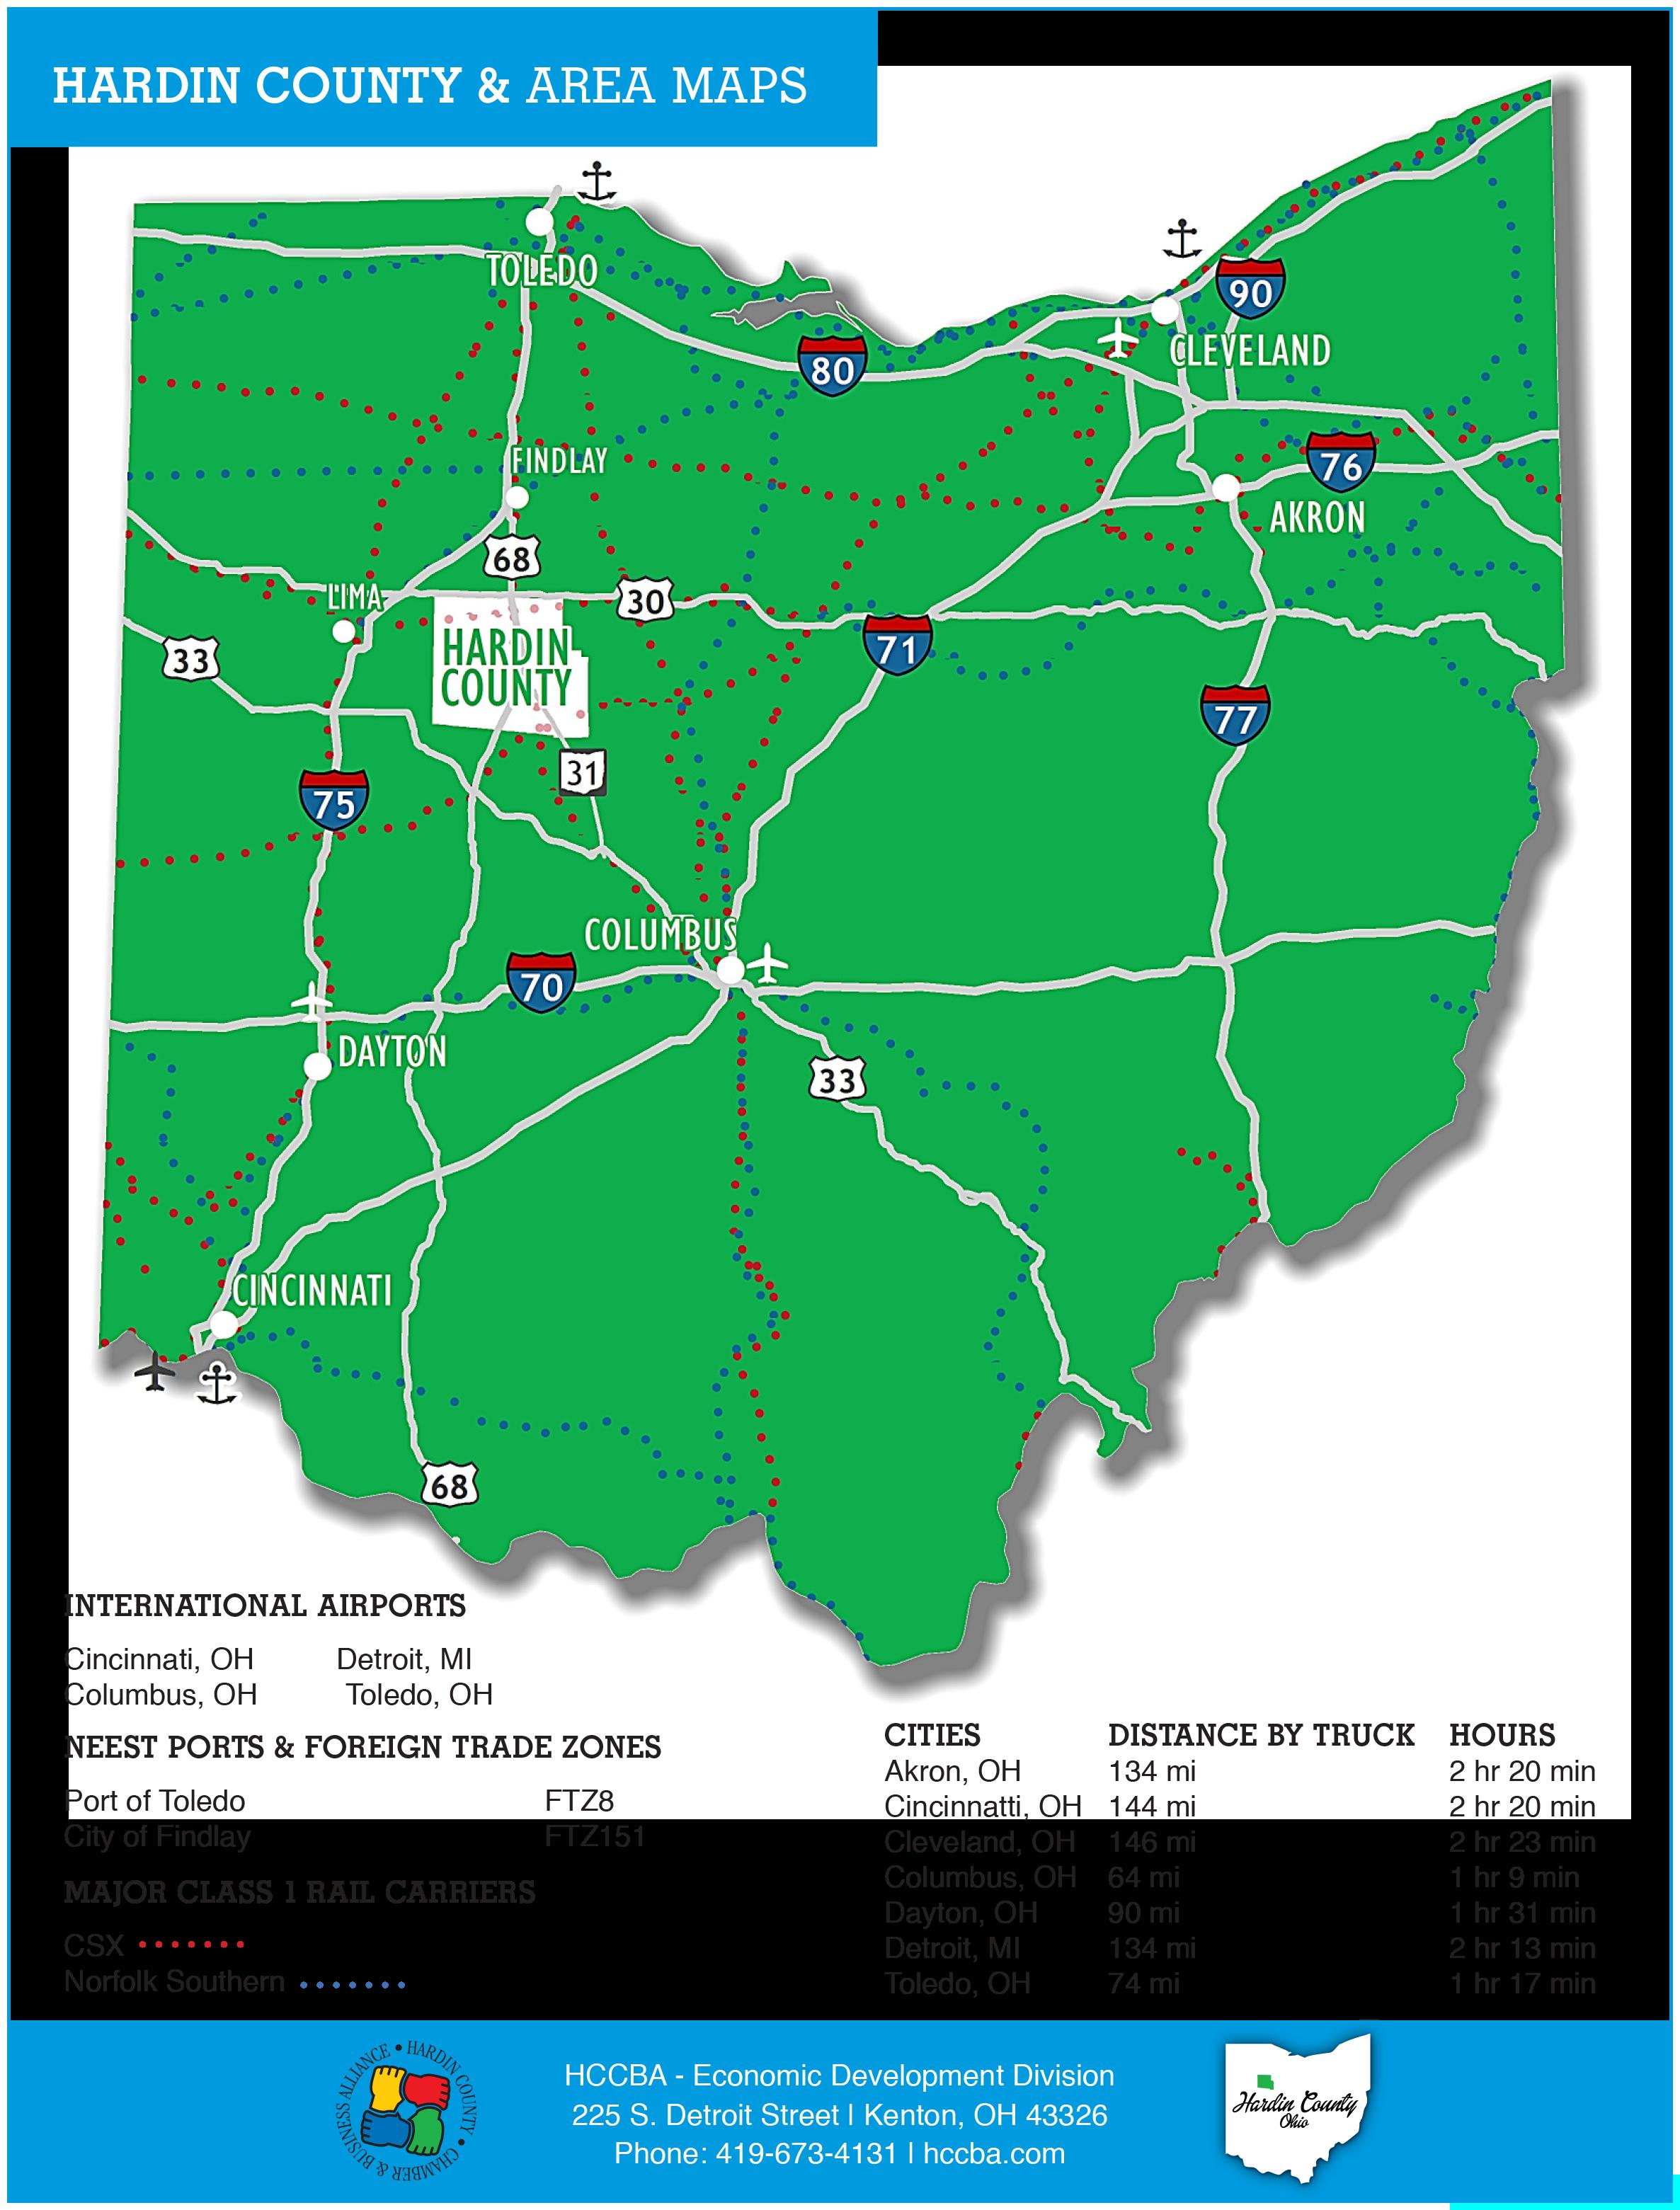 Maps - thumbnail image